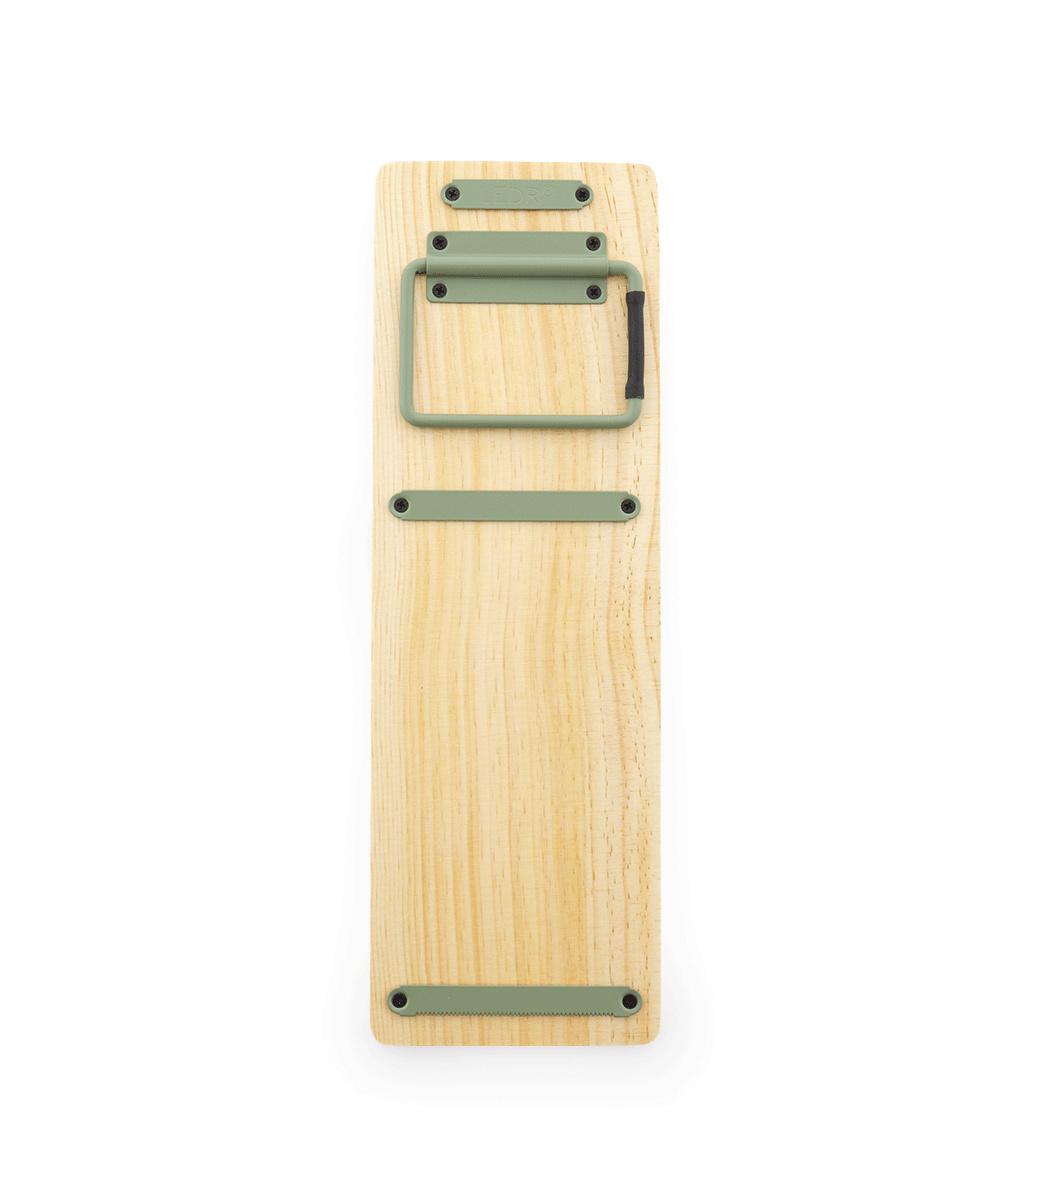 Kraft Paper Roller S - Groen-7